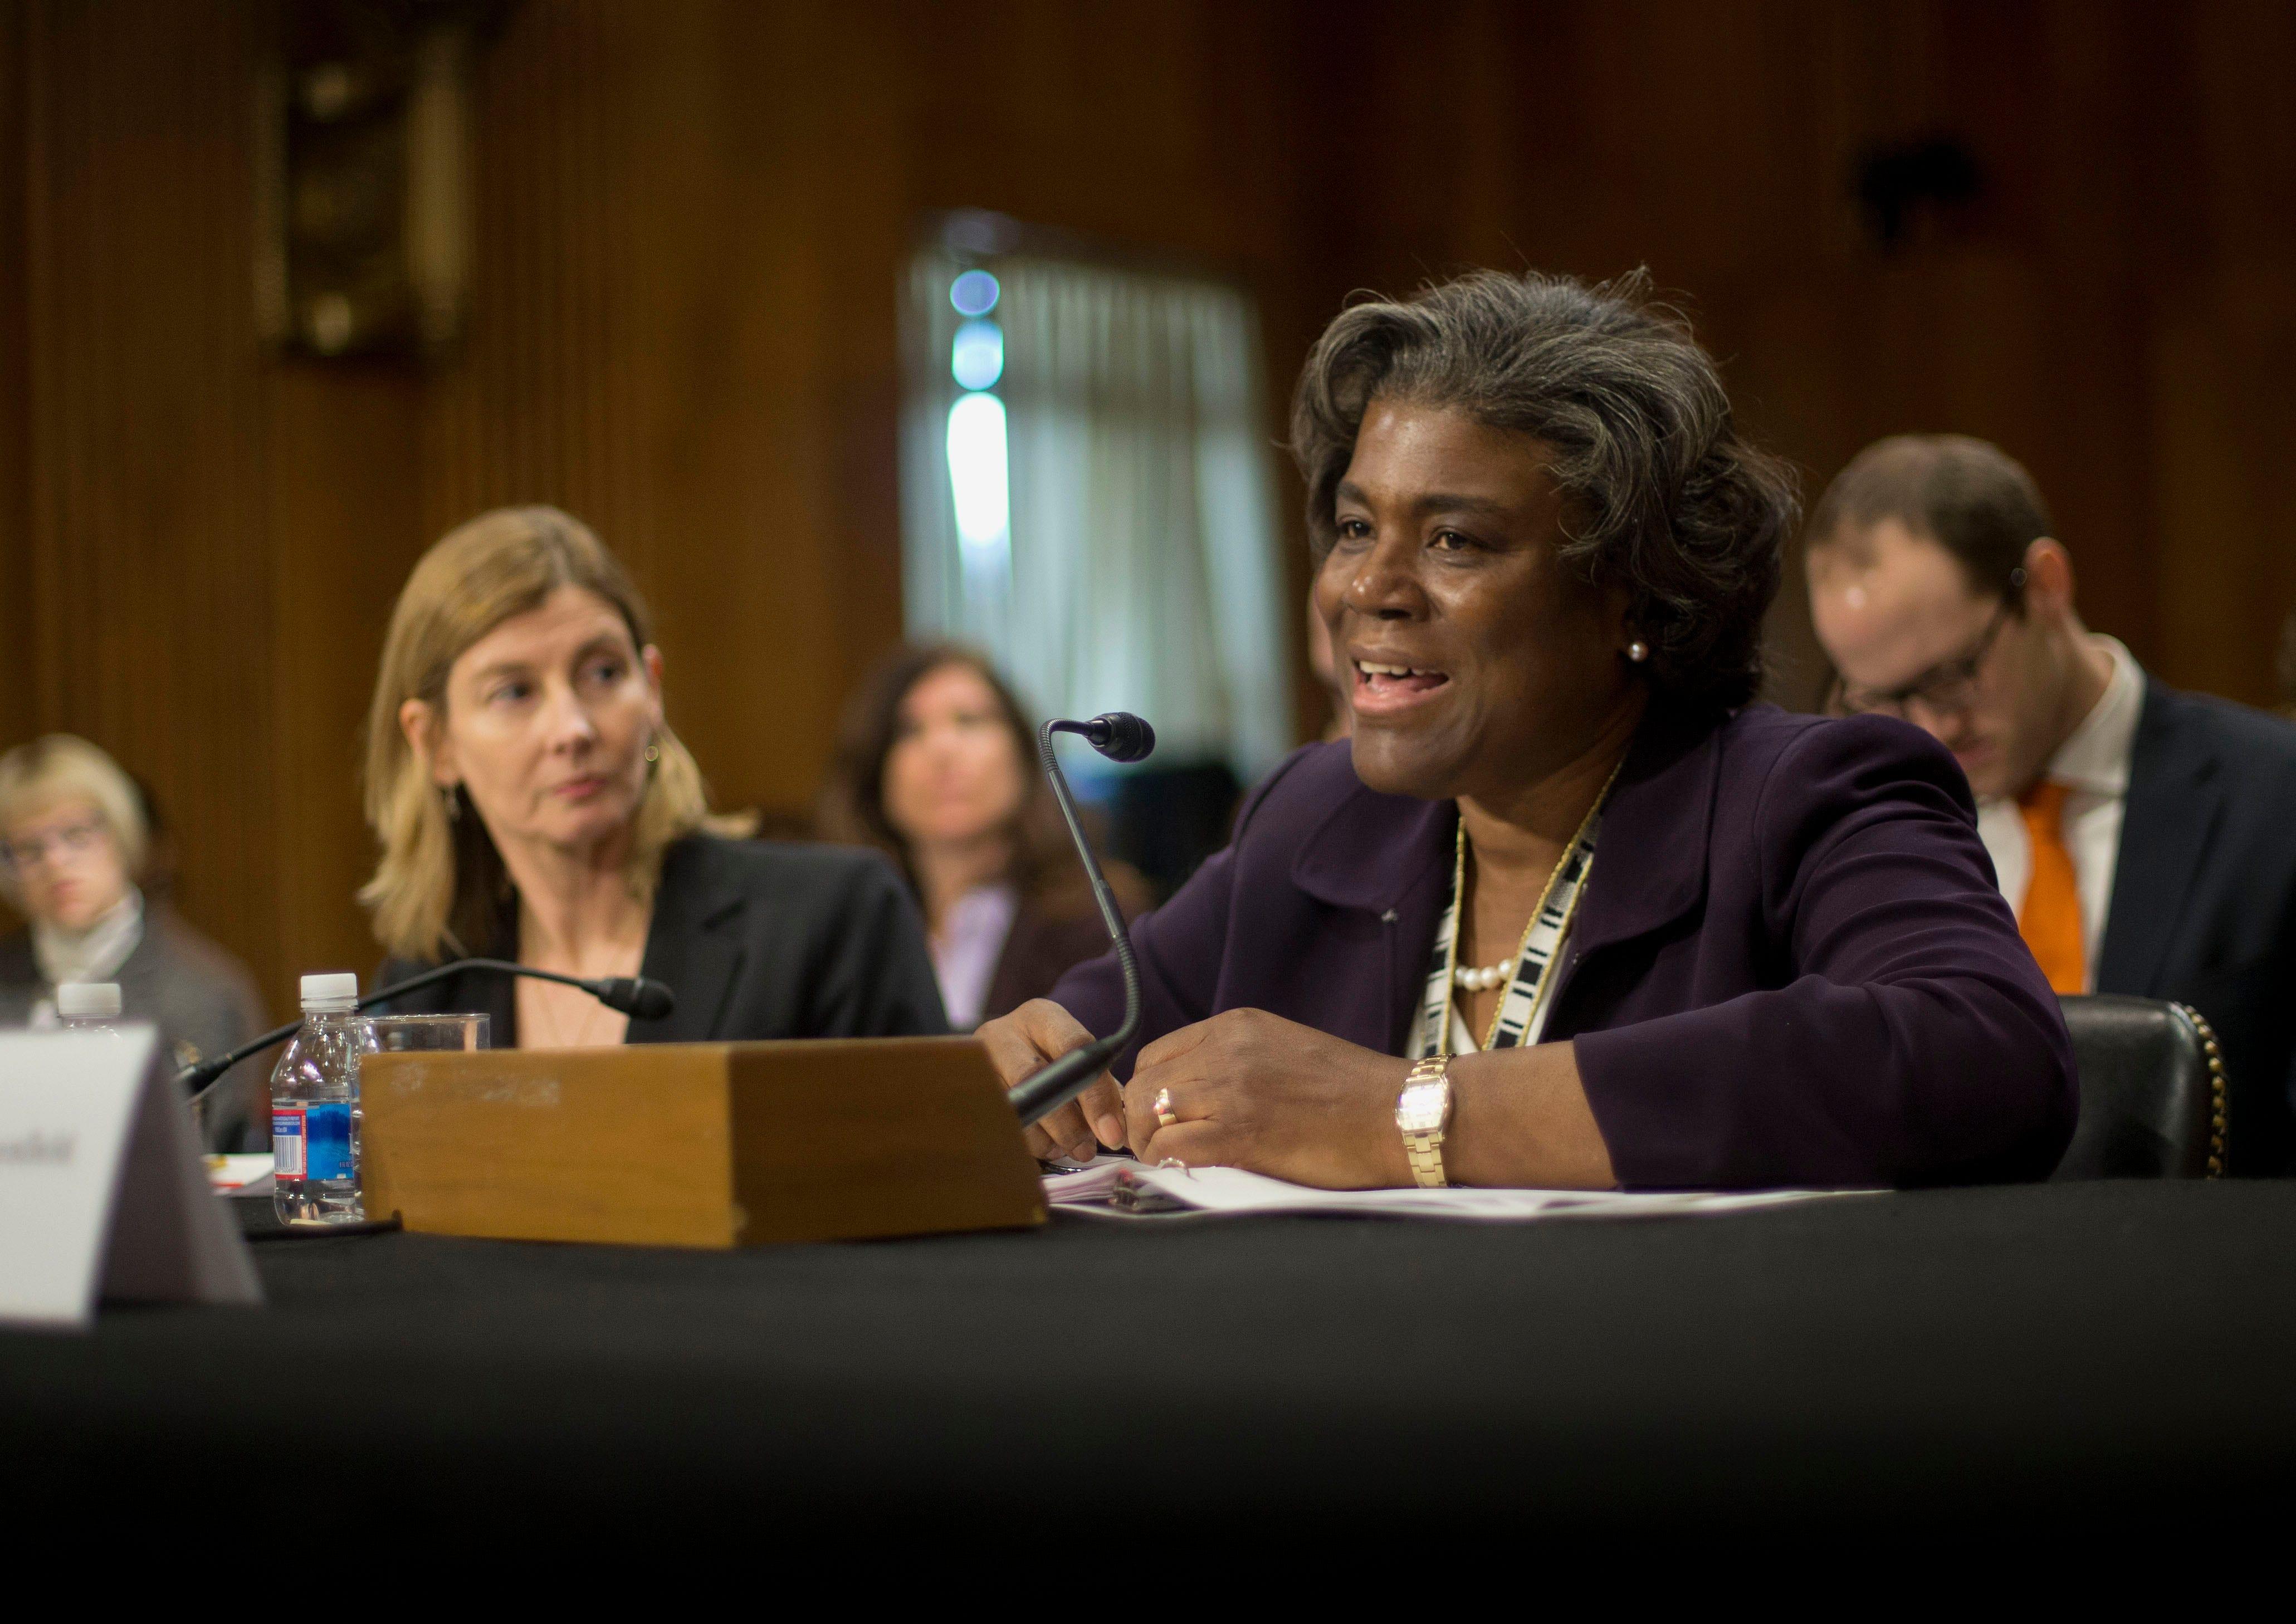 A diplomatic powerhouse : Biden will nominate Linda Thomas-Greenfield as UN ambassador